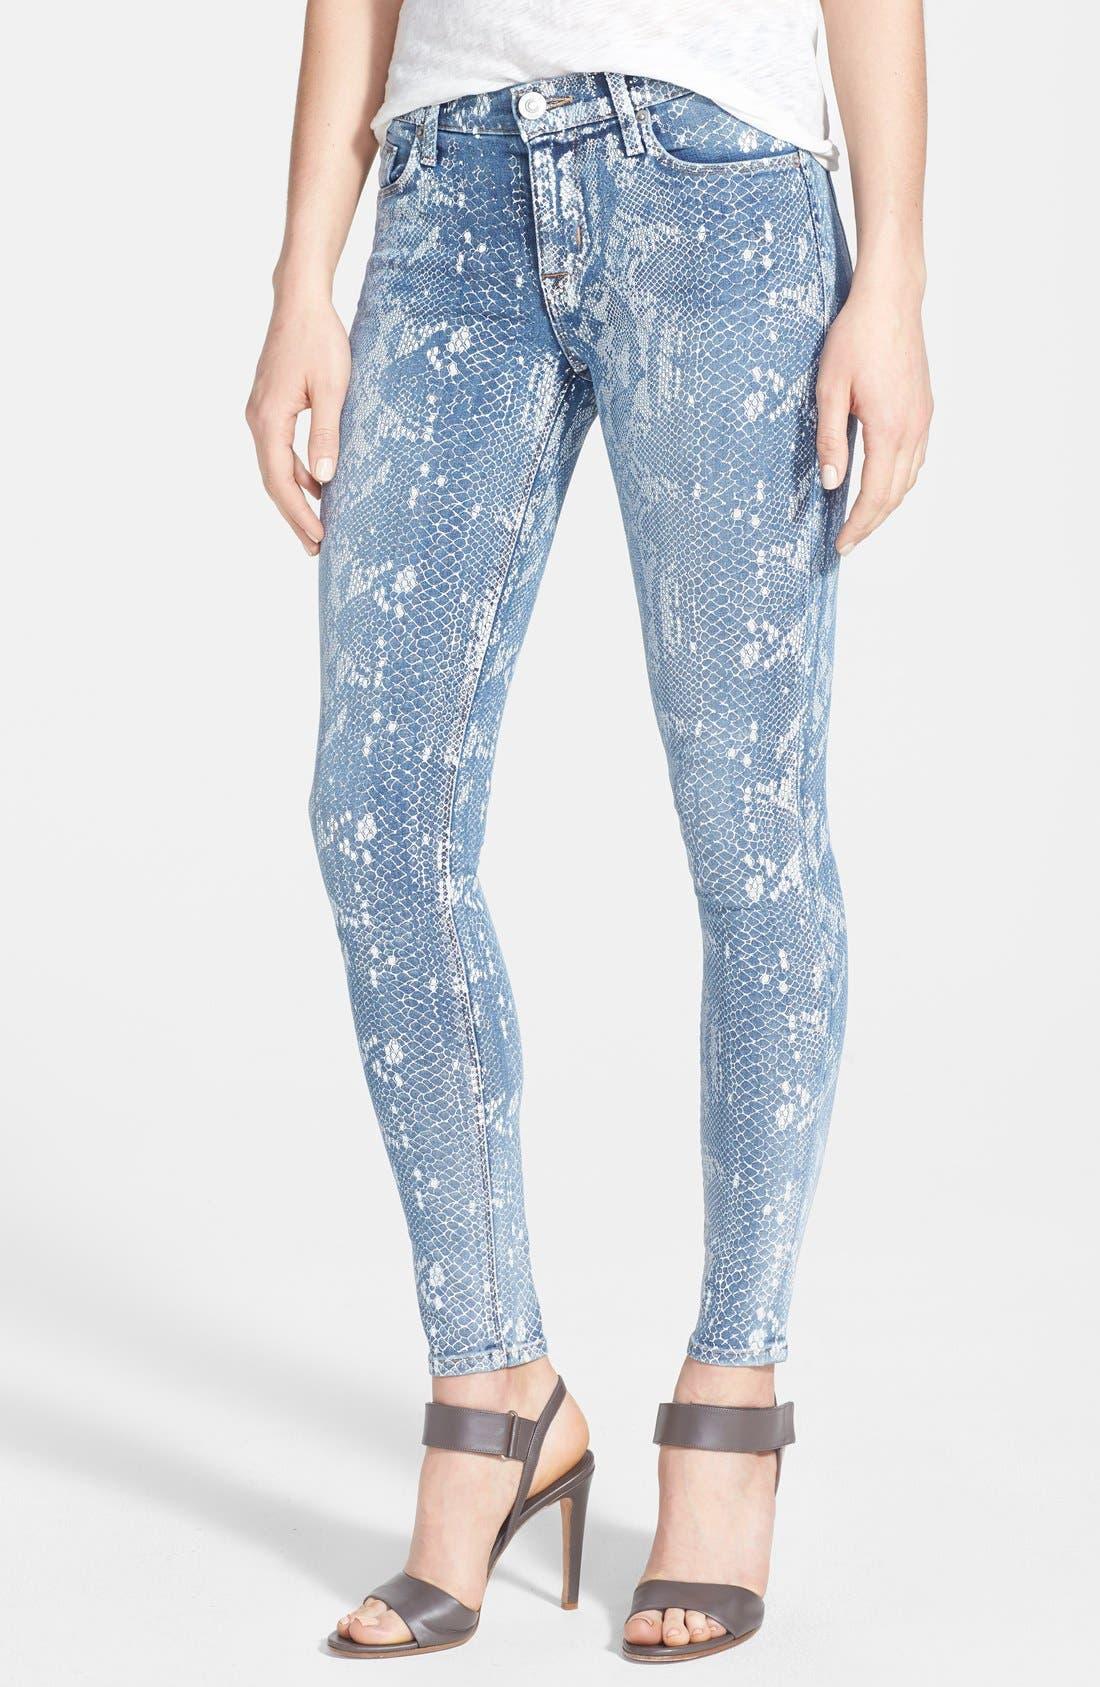 Alternate Image 1 Selected - Hudson Jeans 'Nico' Print Skinny Stretch Jeans (Copperhead)